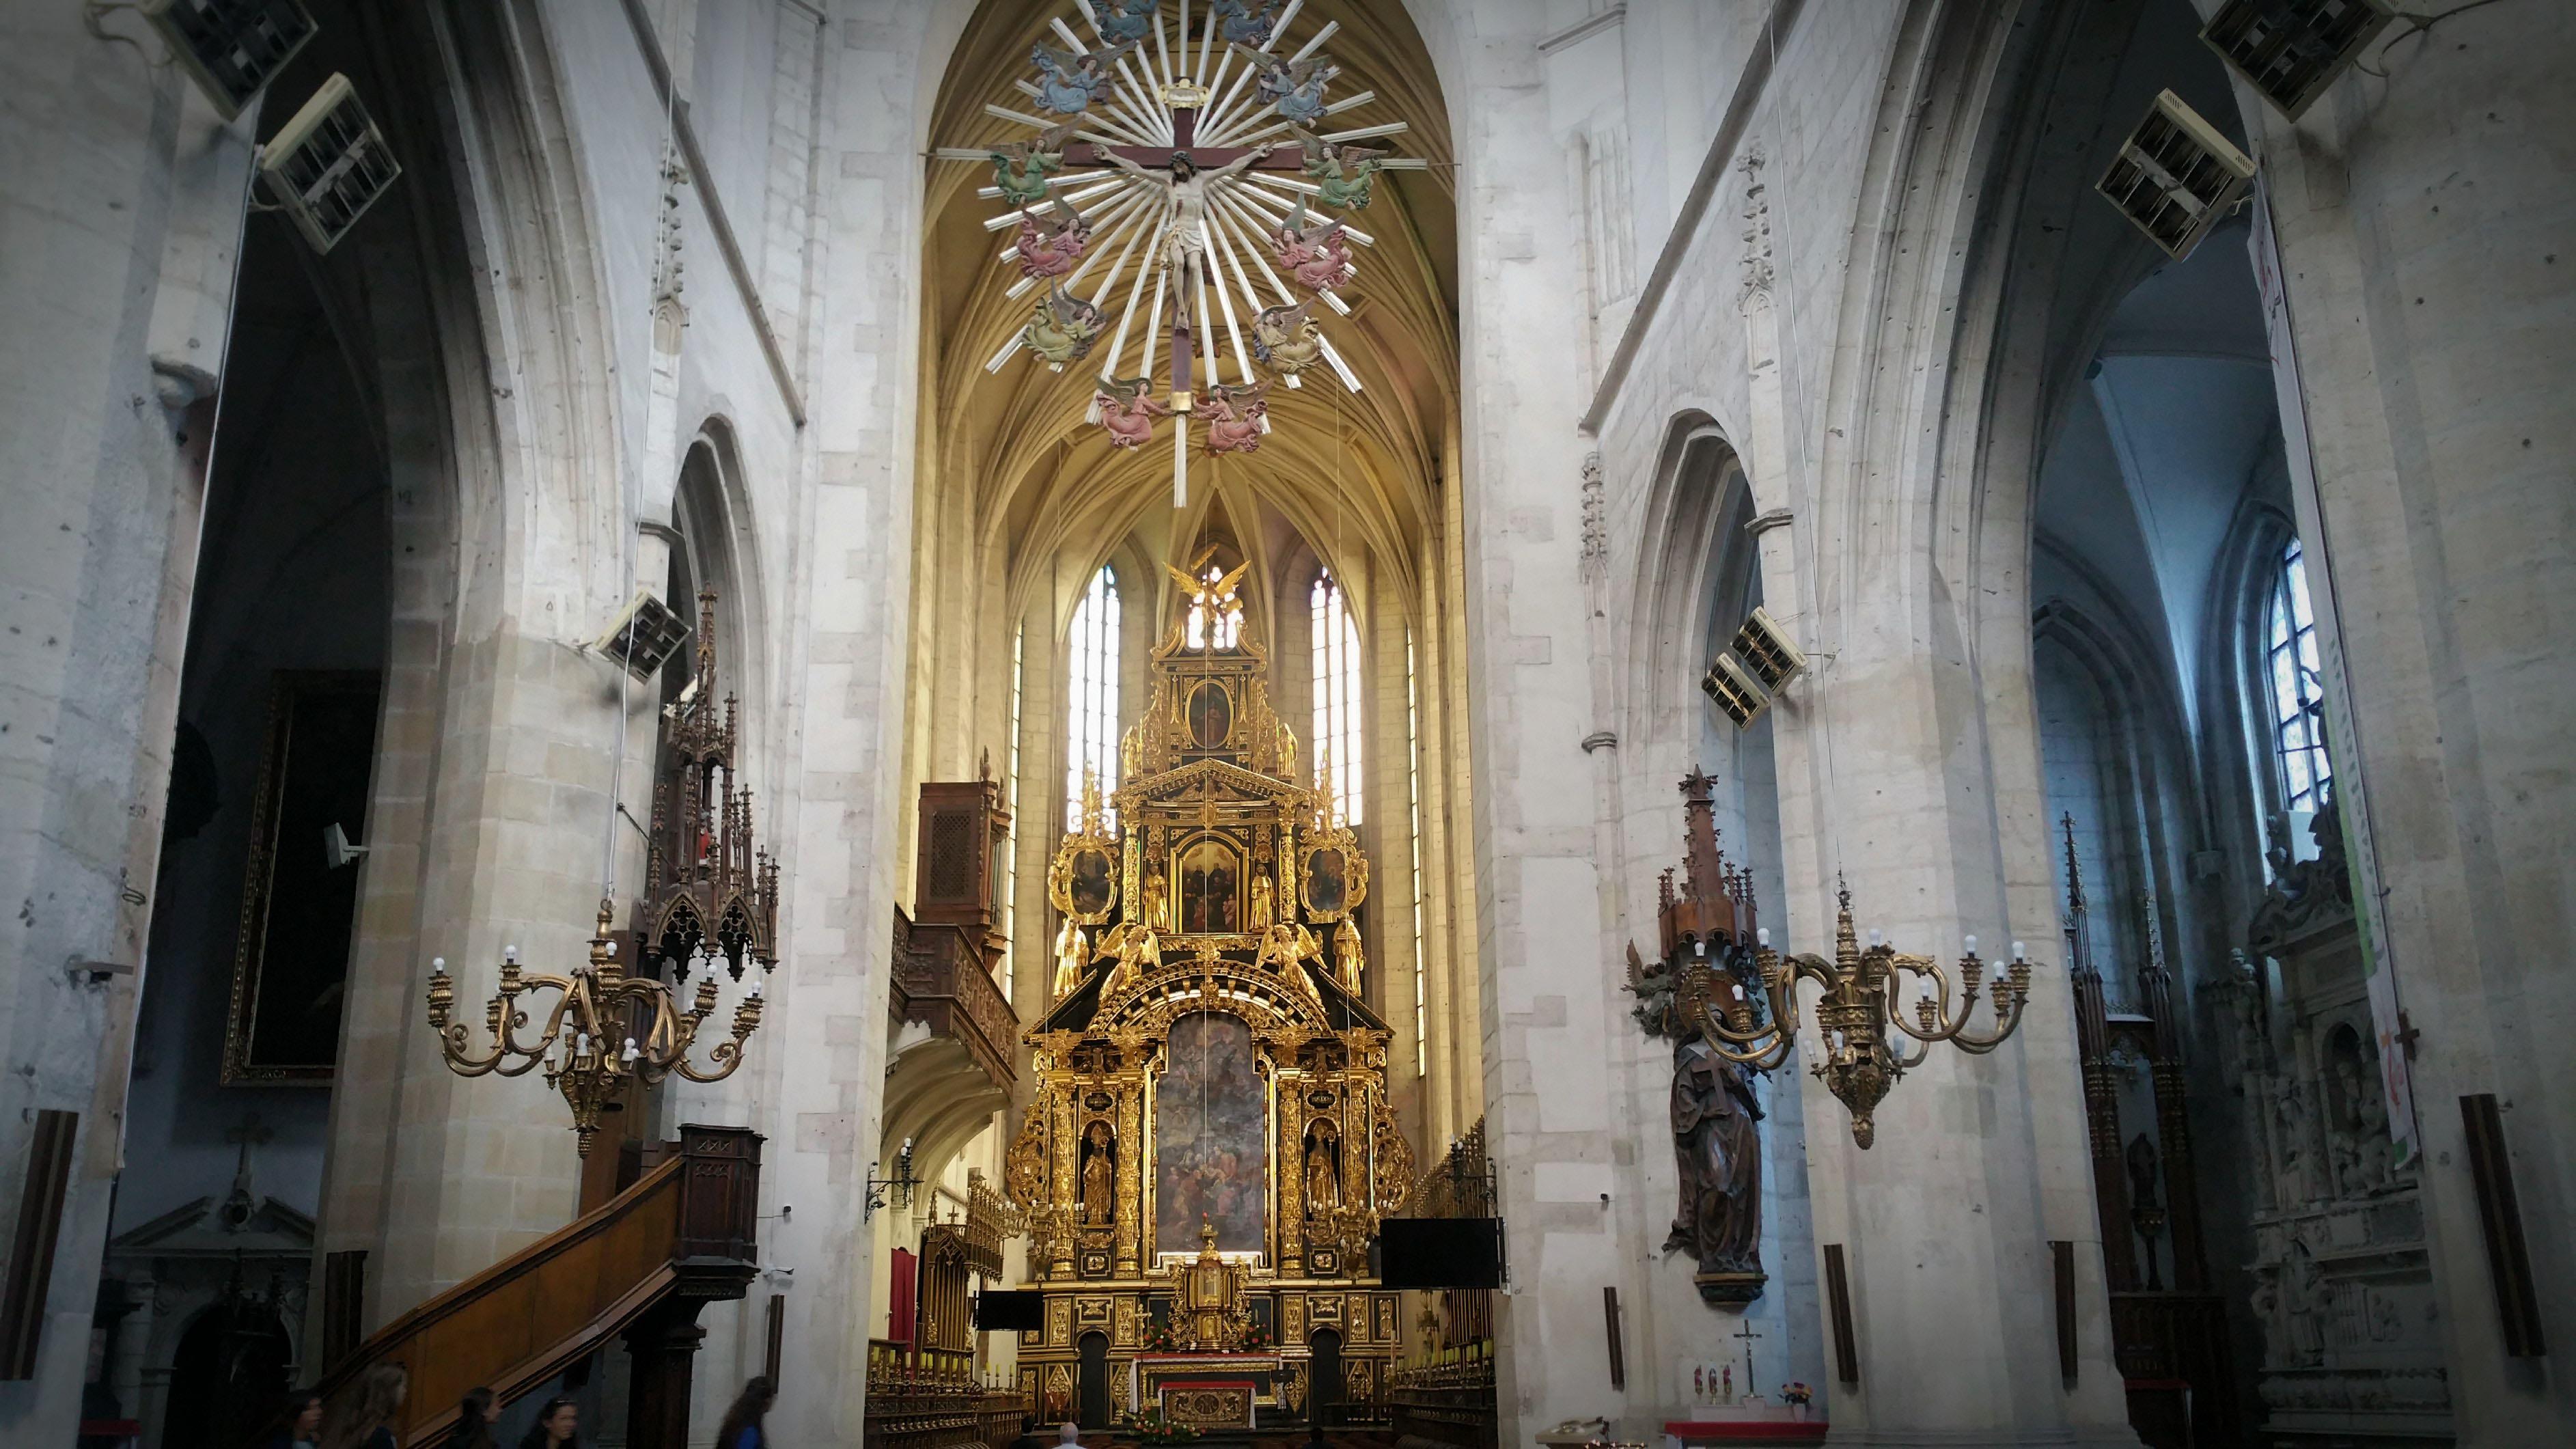 https://i2.wp.com/troubadour.francis.edu/wp-content/uploads/2016/07/Blog-8-fraley-church-interior.jpg